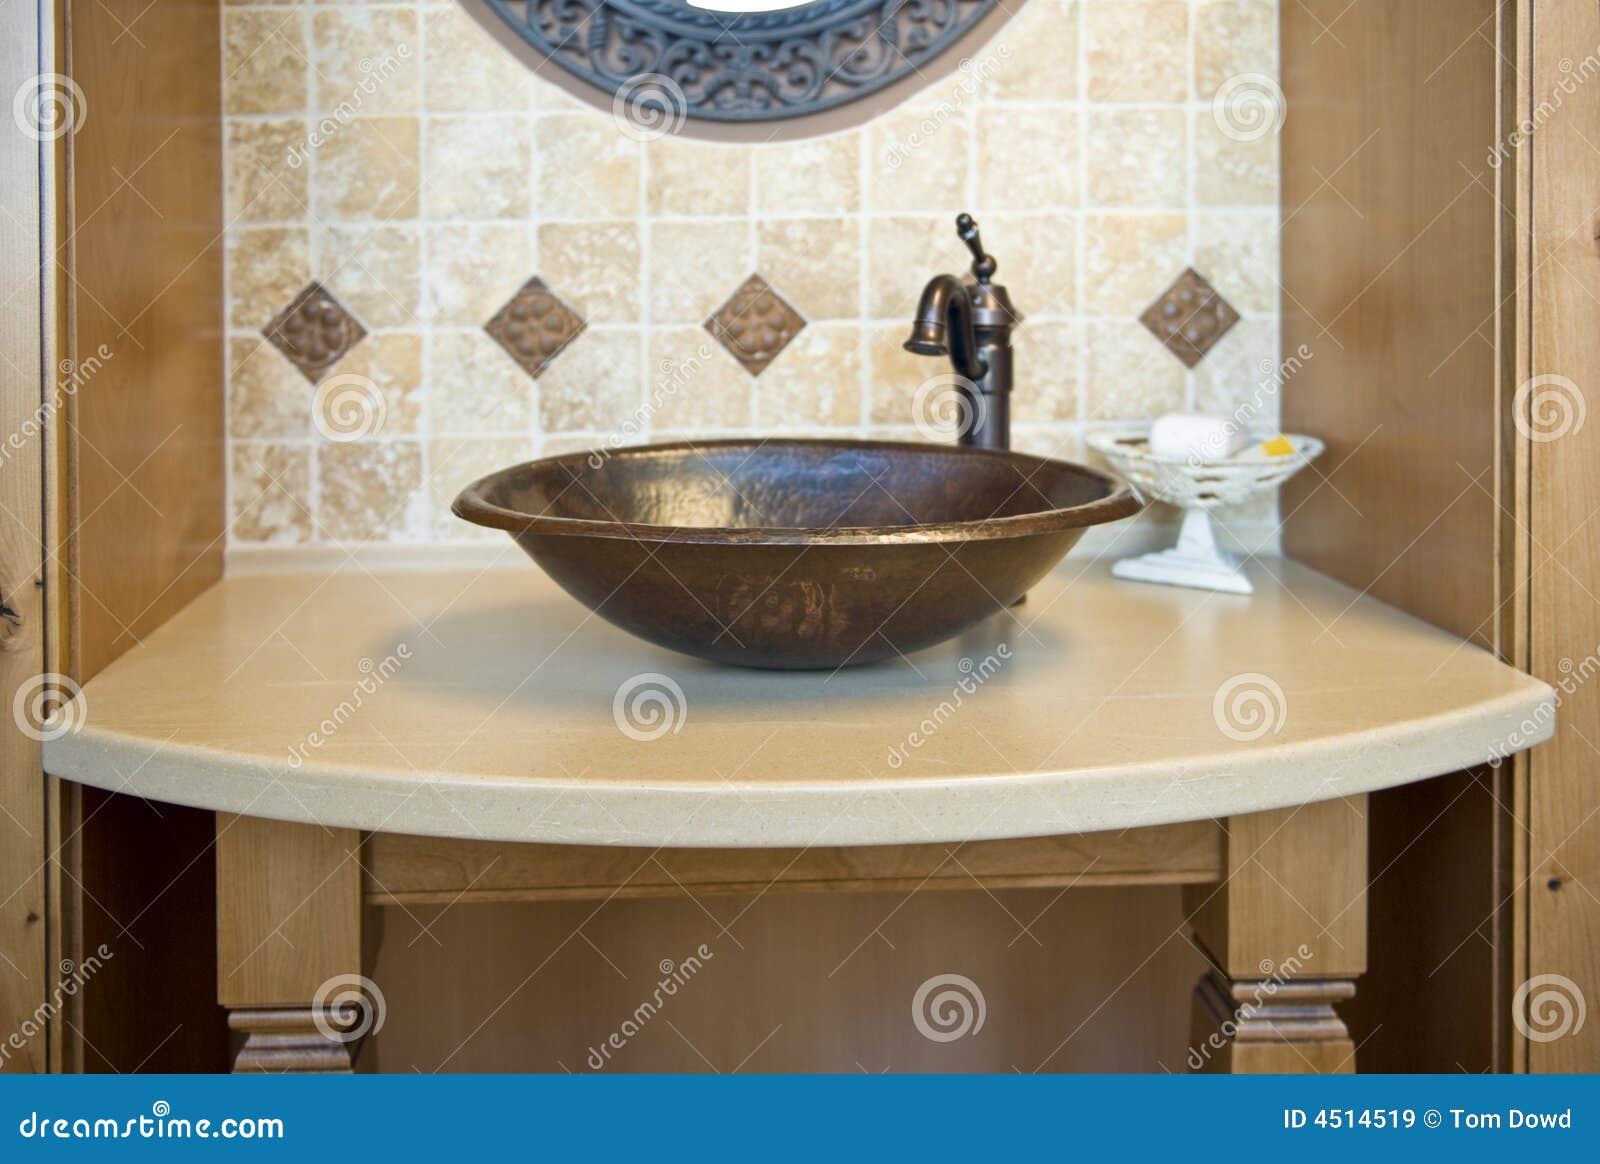 Decorative Bathroom Sink Stock Image Image Of Inside